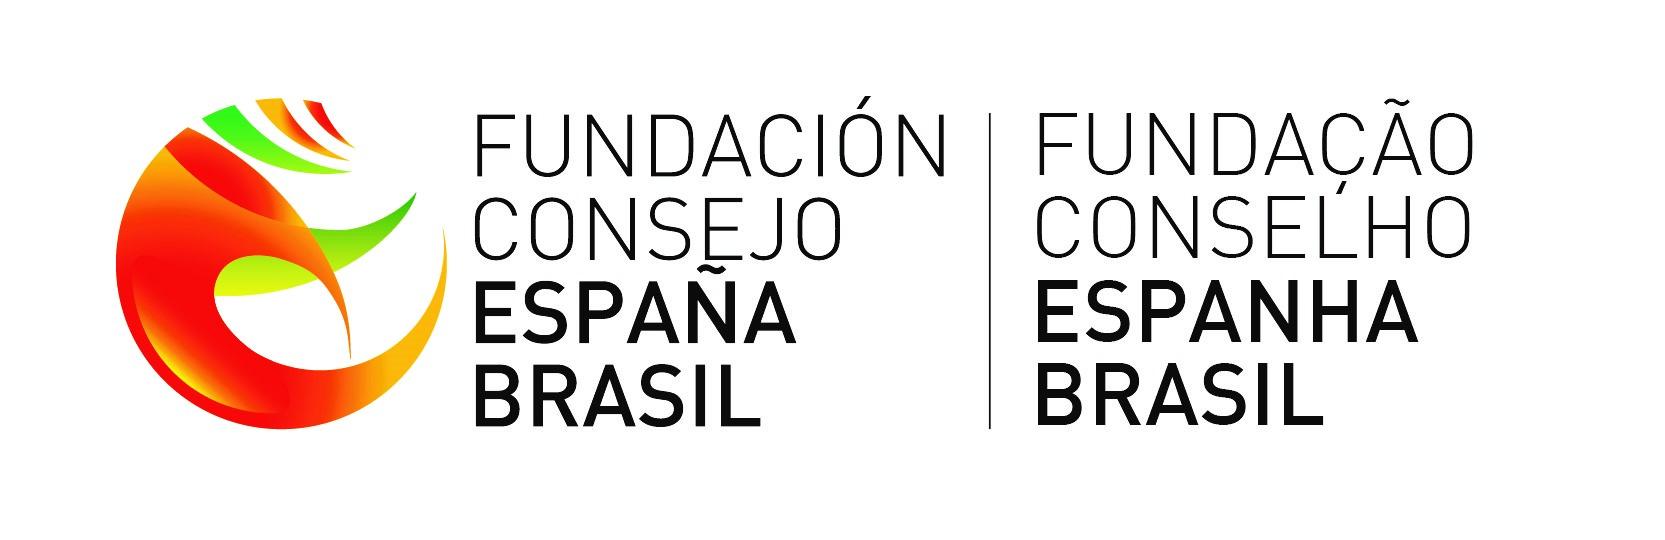 LOGO FCEBrasil bilingüe